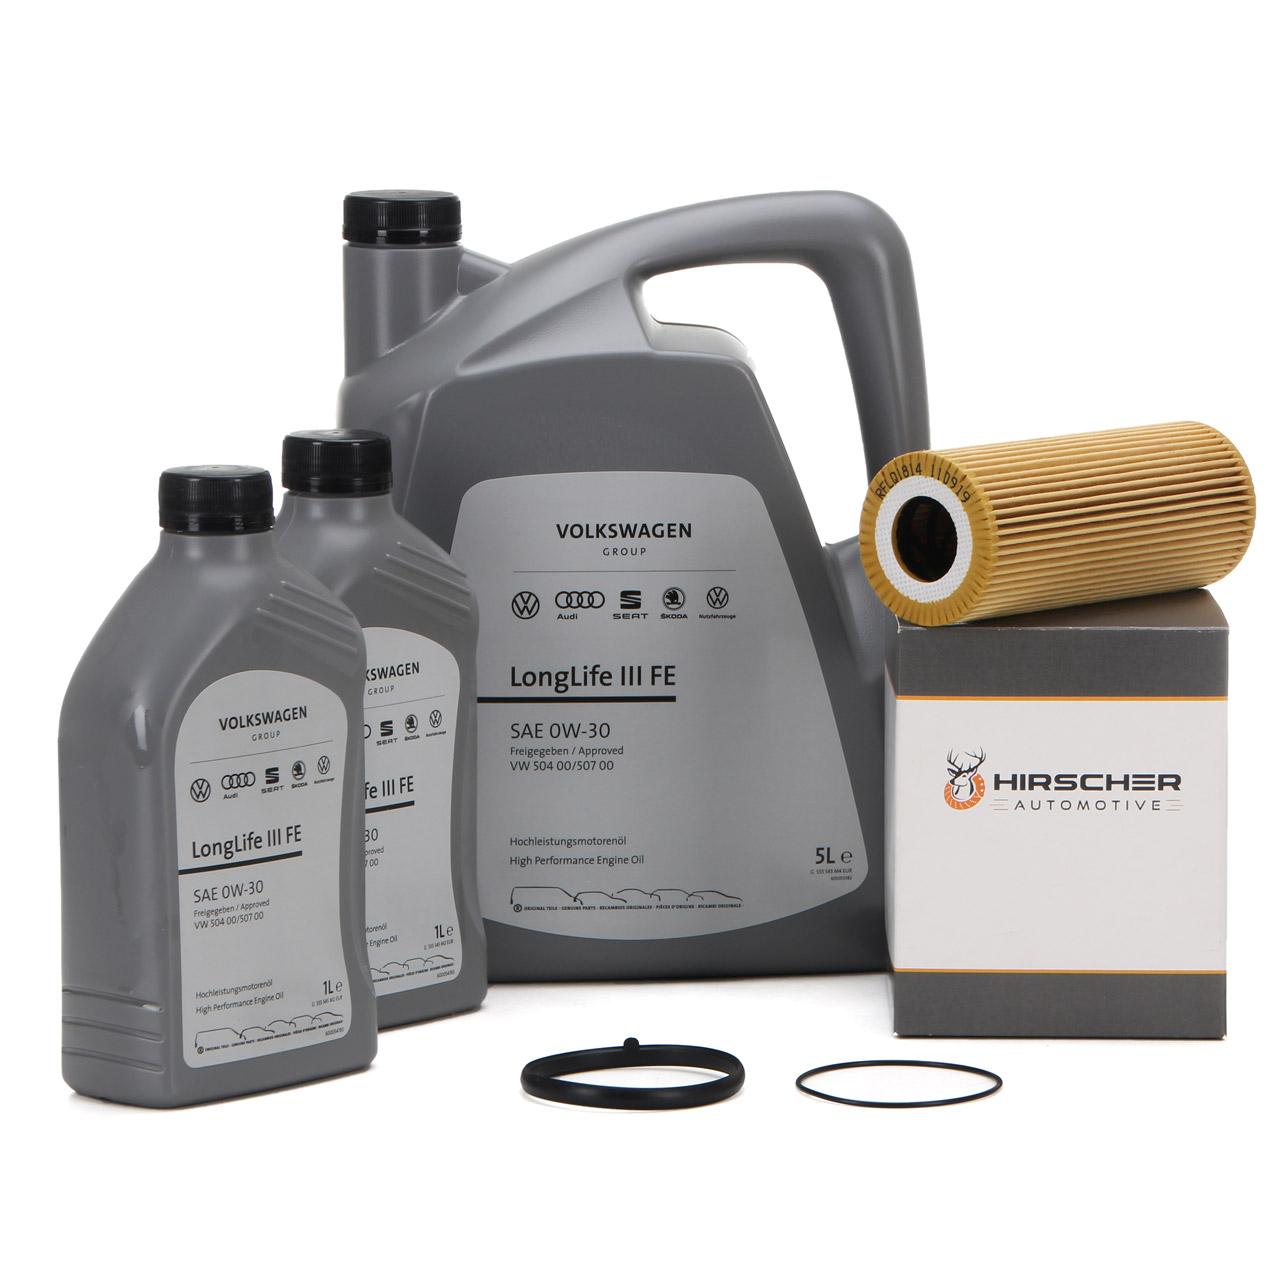 ORIGINAL VW Motoröl Öl 0W30 LONGLIFE III FE 7 L + HIRSCHER Ölfilter 06E115562C